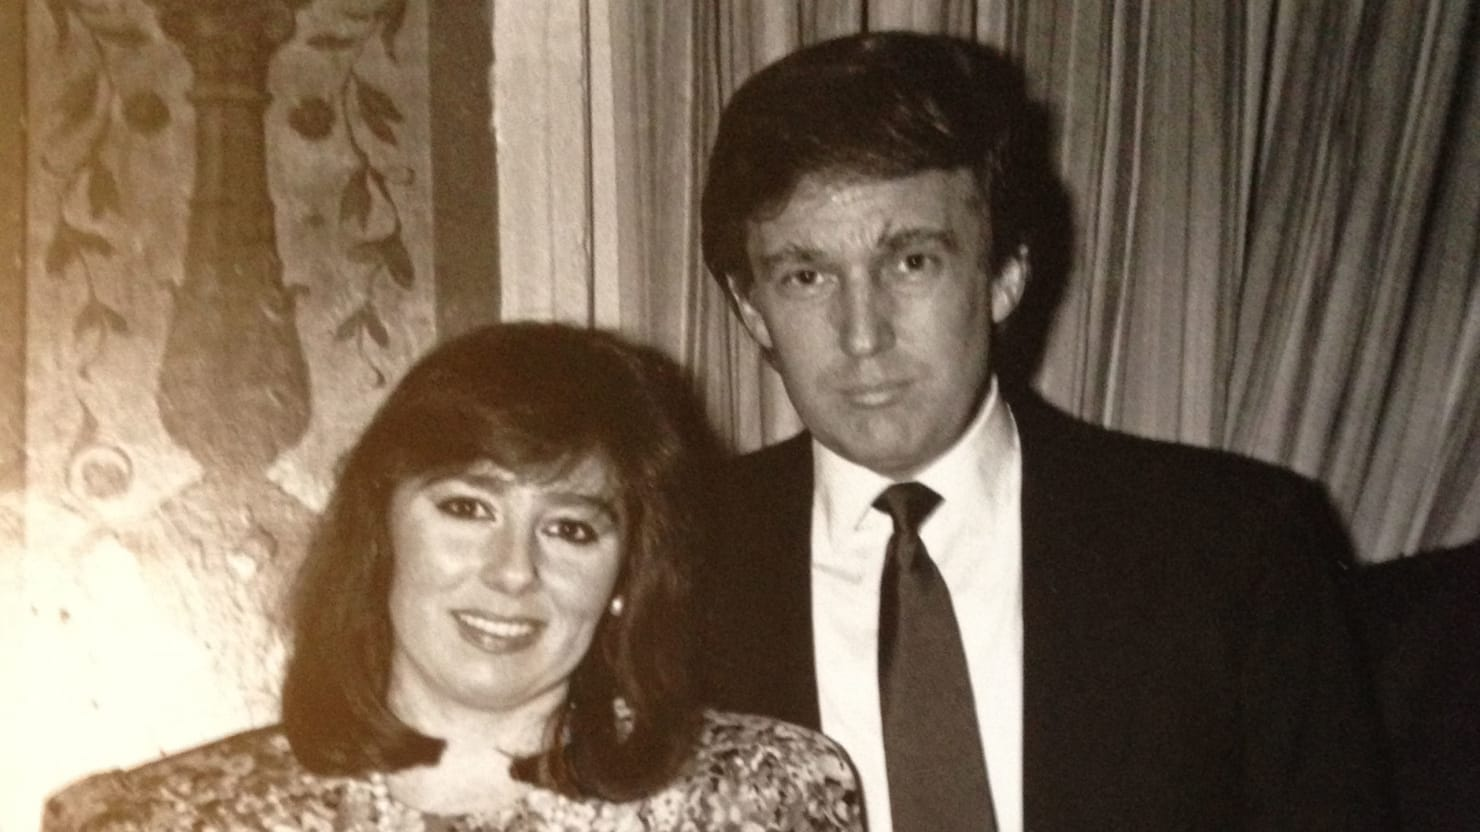 Former Donald Trump Executive: 'He's a Supreme Sexist'